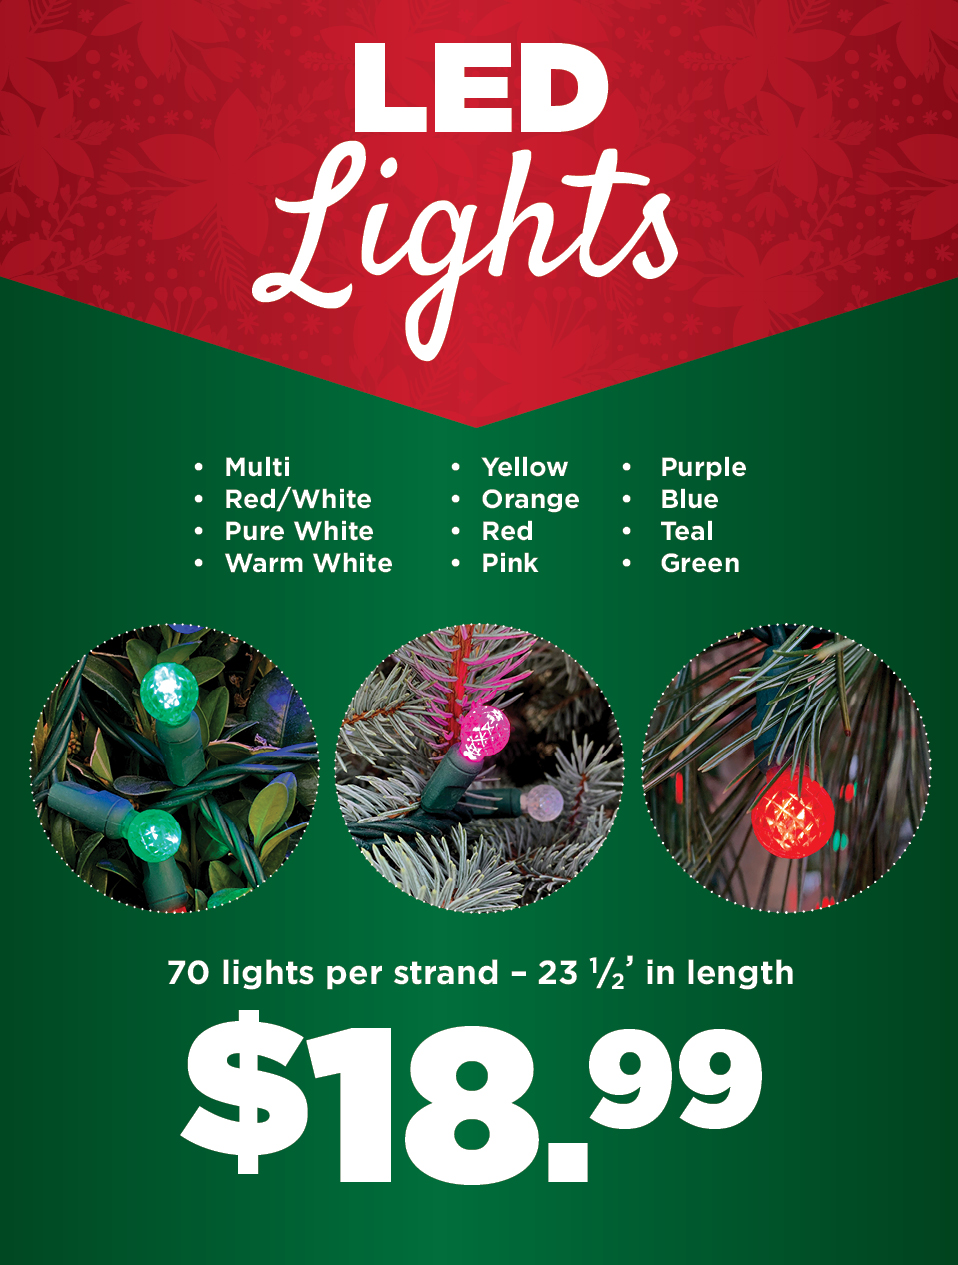 LED Lights | TLC Garden Centers